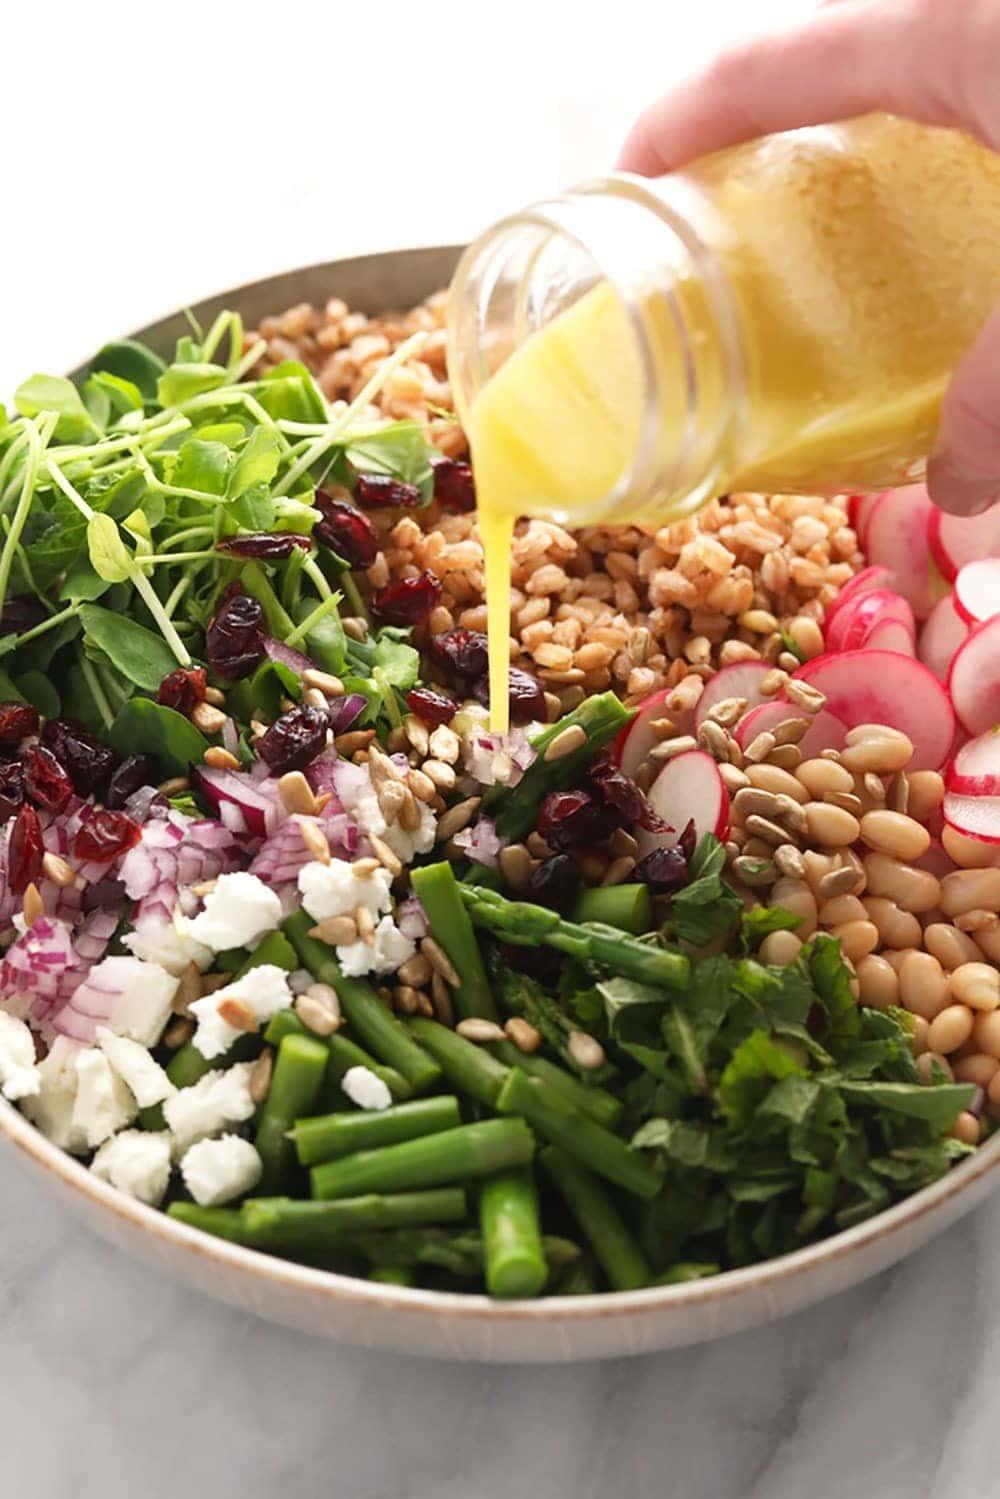 homemade lemon vinaigrette dressing being poured over a salad